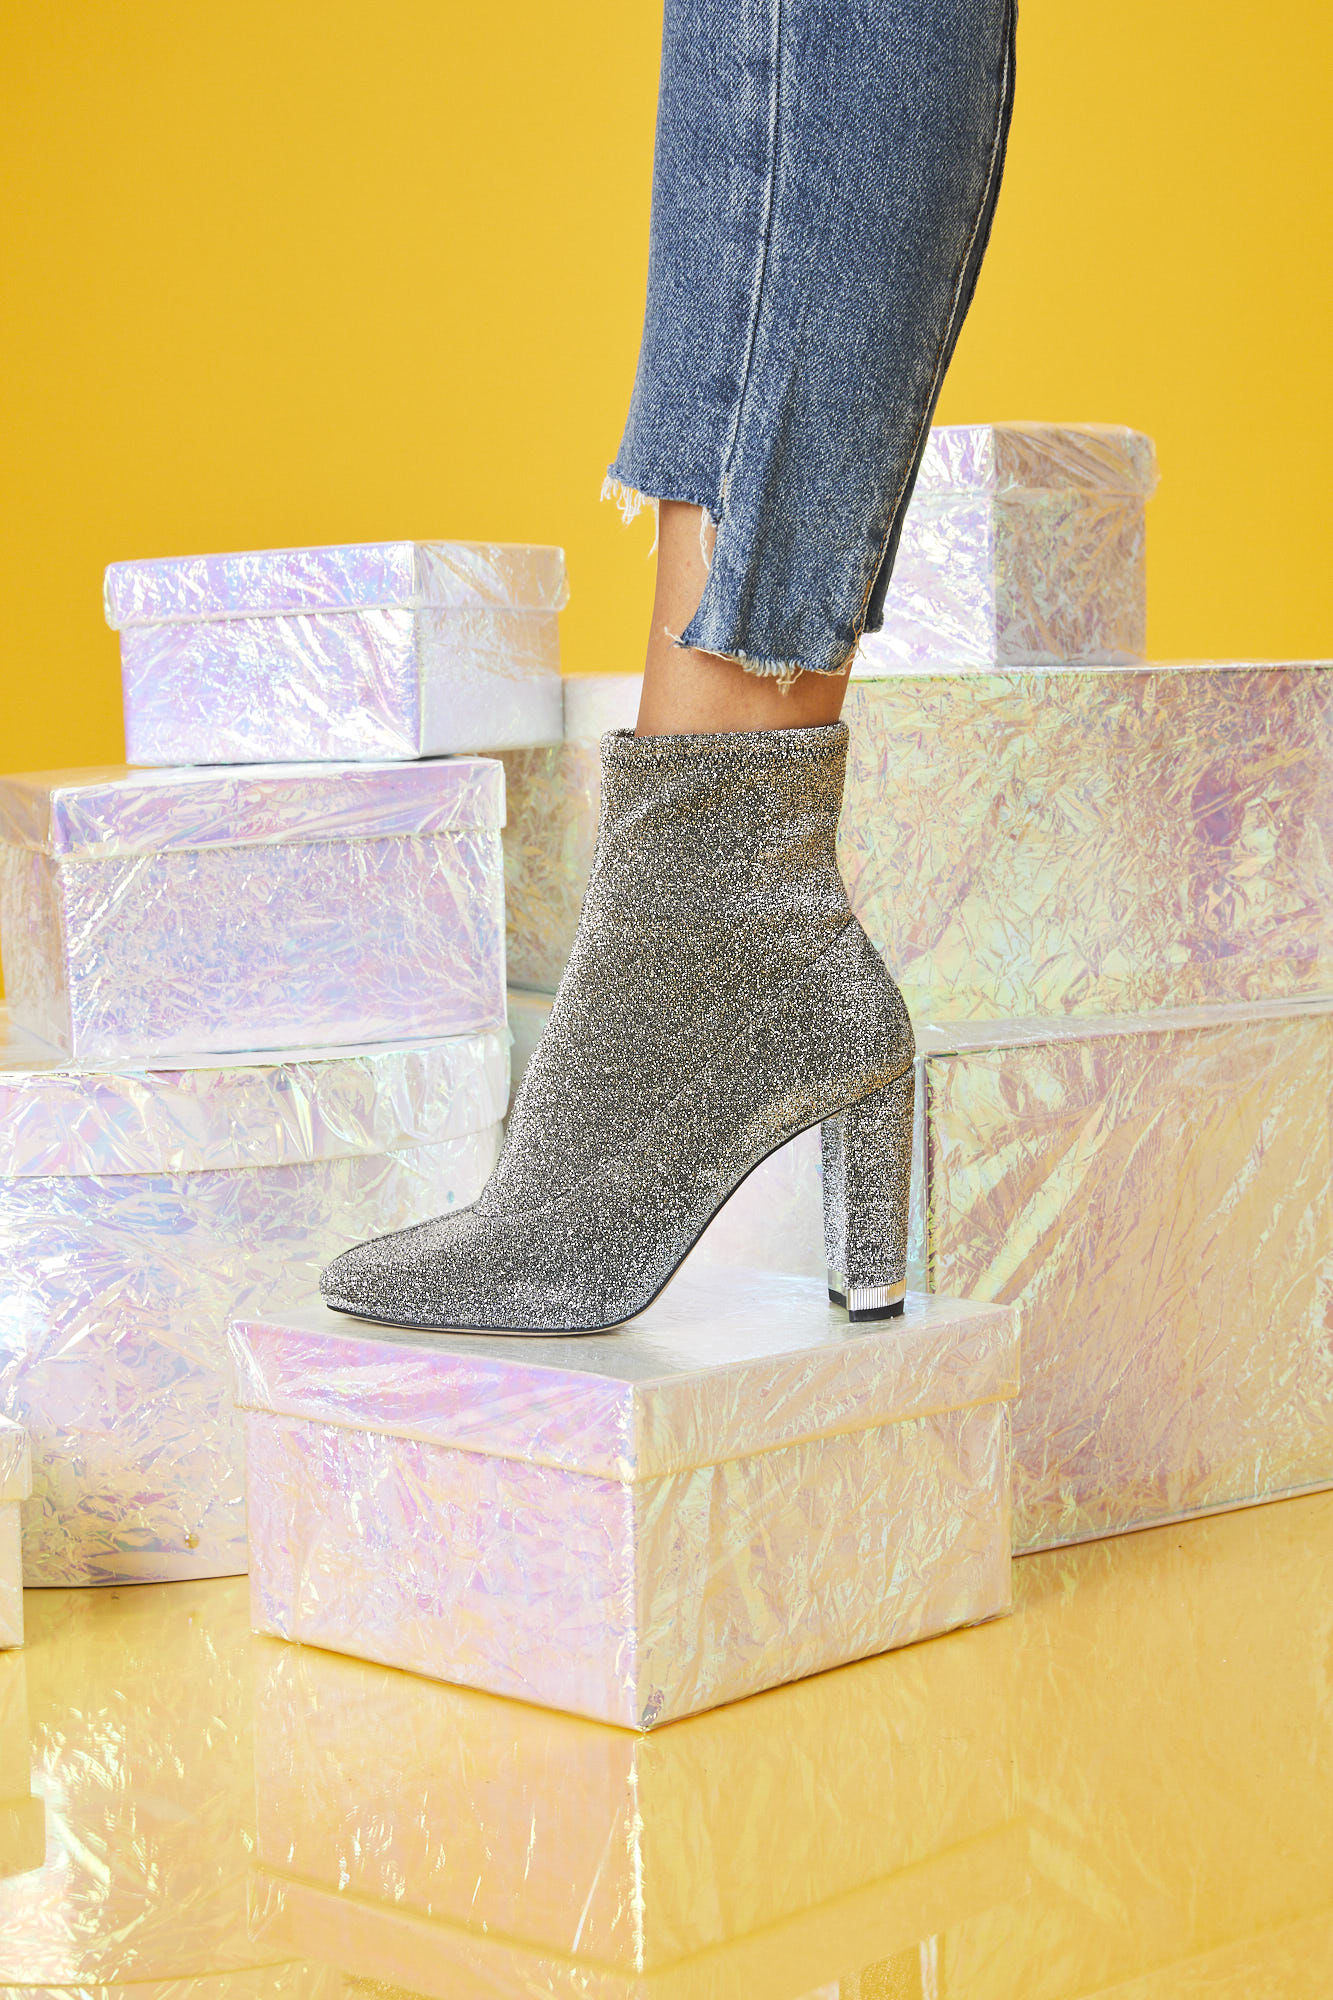 13_Glitter_Shoes1_0005.jpg